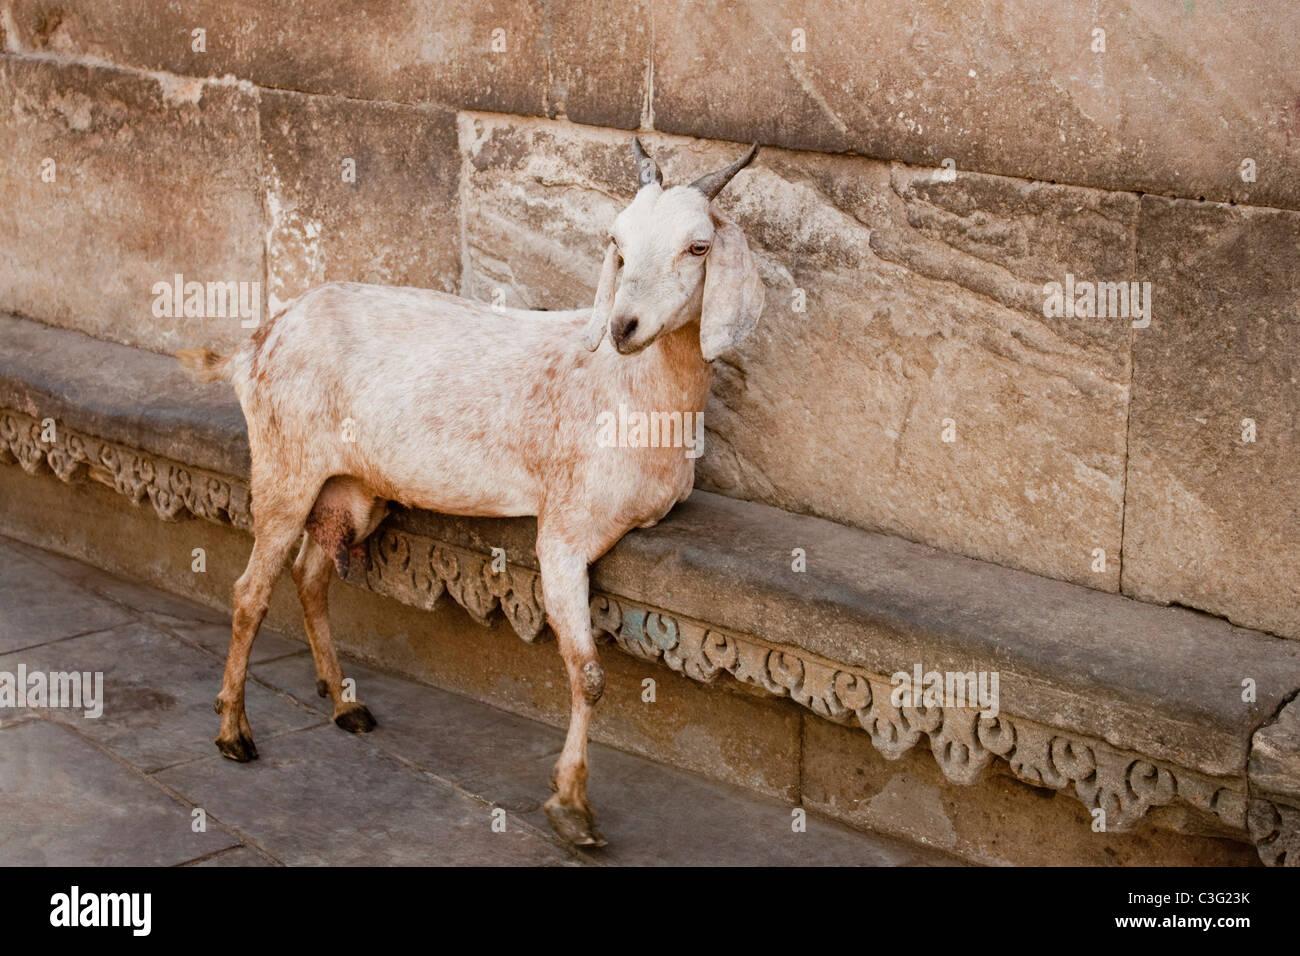 Goat leaning at the wall, Ahmedabad, Gujarat, India - Stock Image